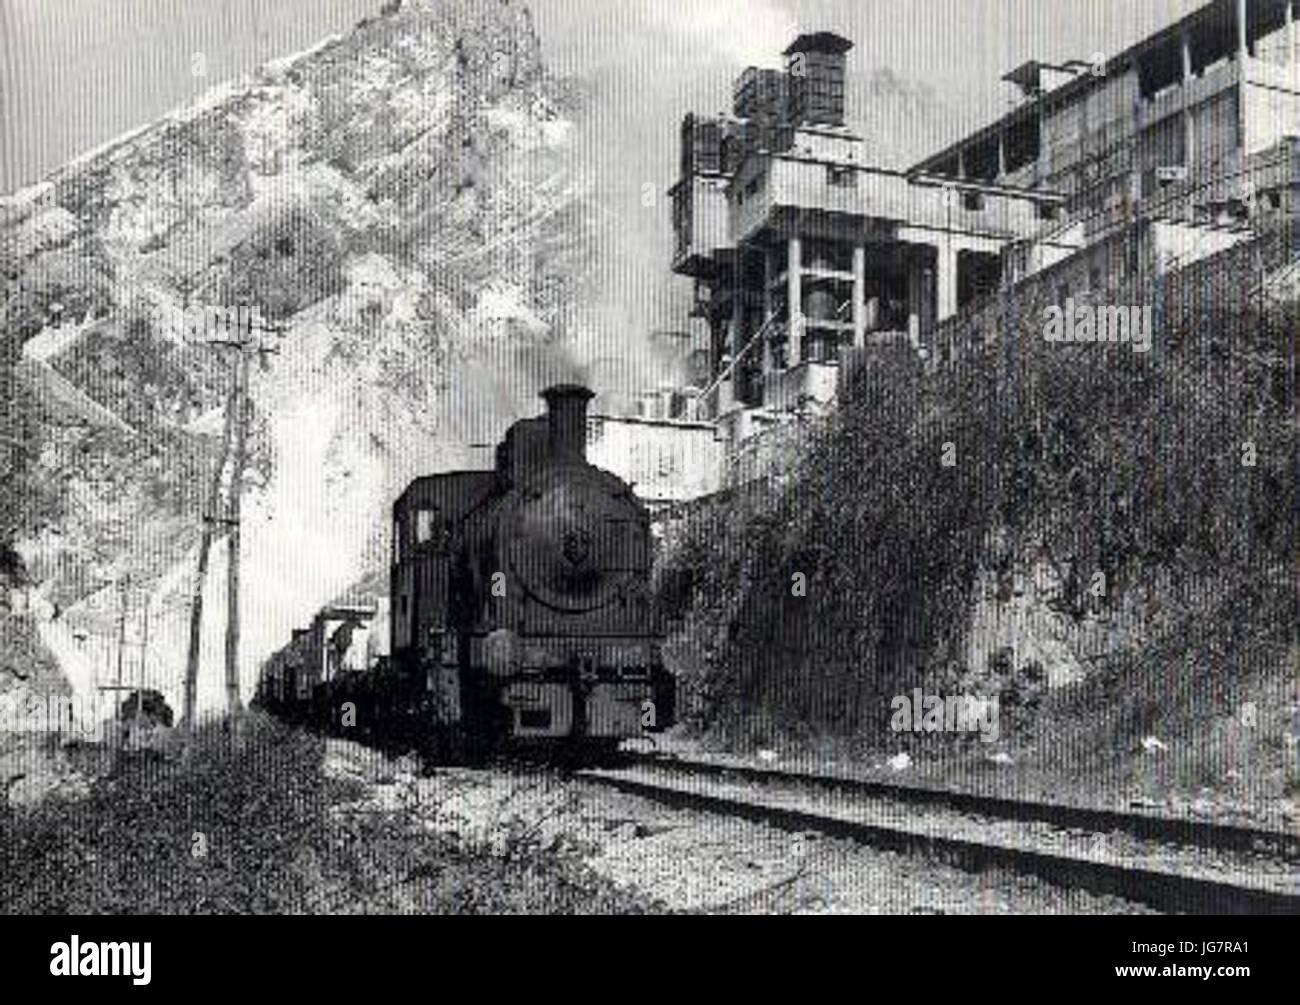 Torano 28Carrara29 - Locomotiva FMC N.7 - Stock Image